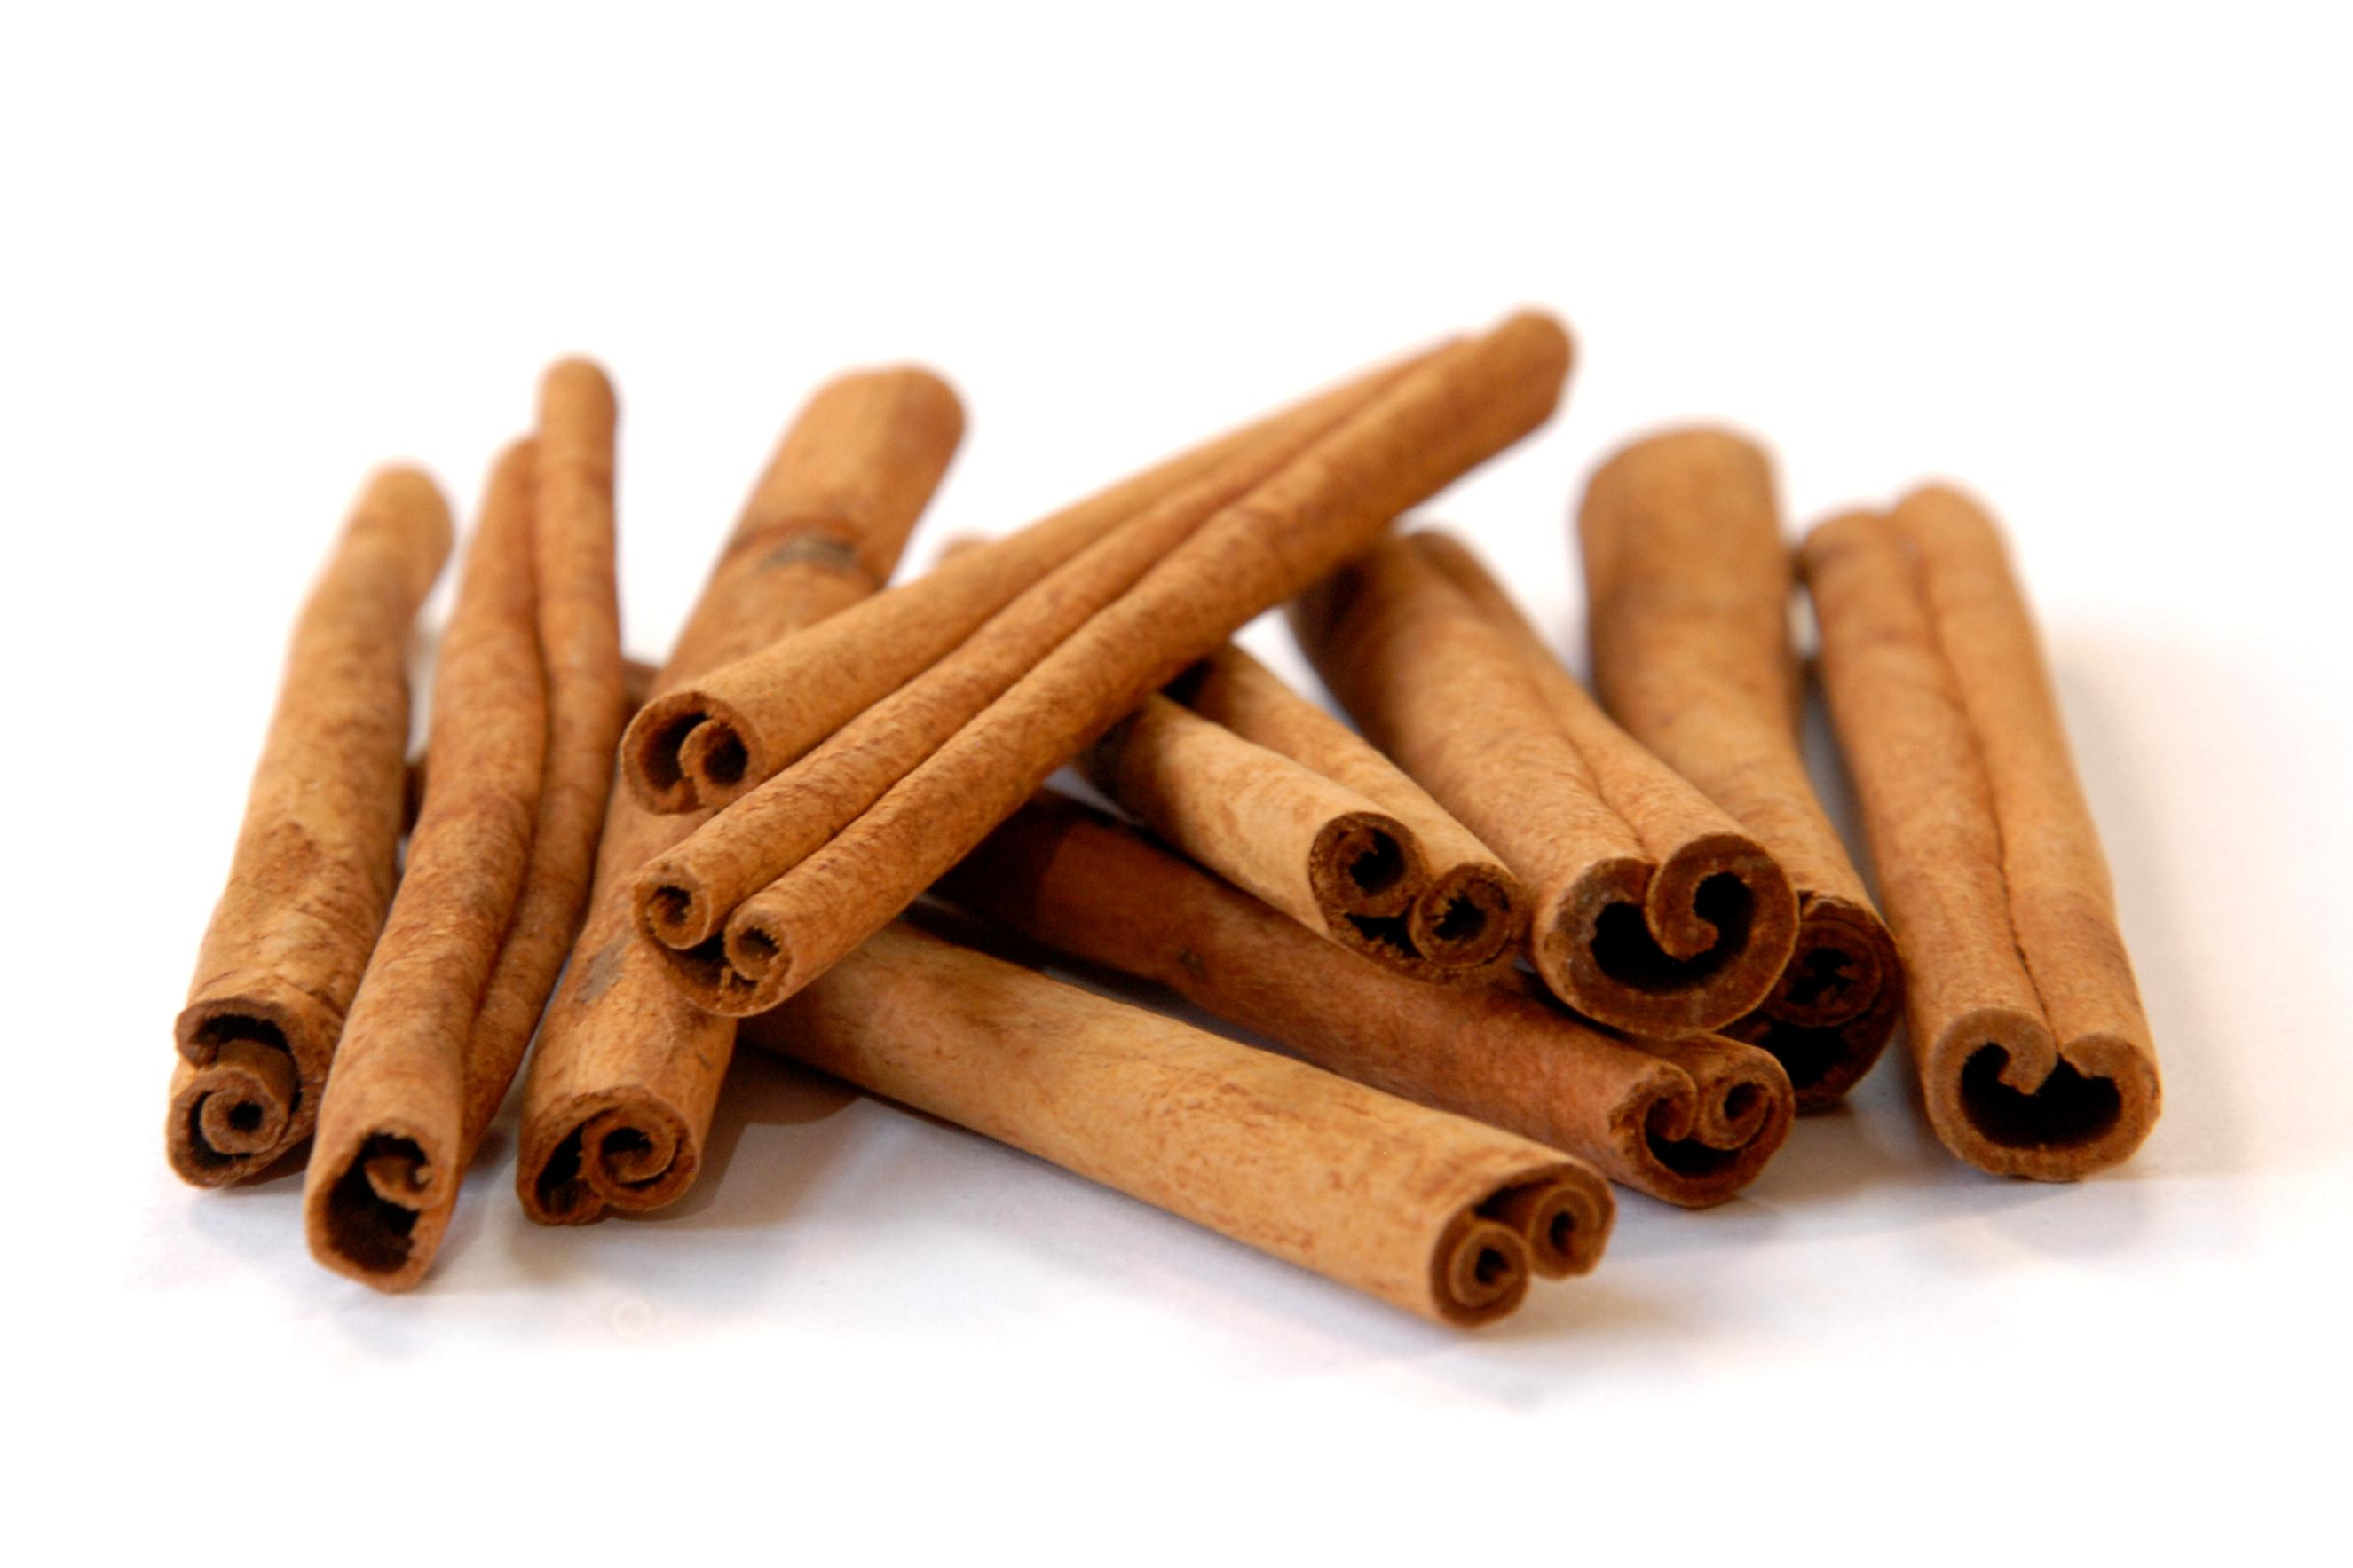 Cinnamon - Daily Cappuccino - Lifestyle Blog